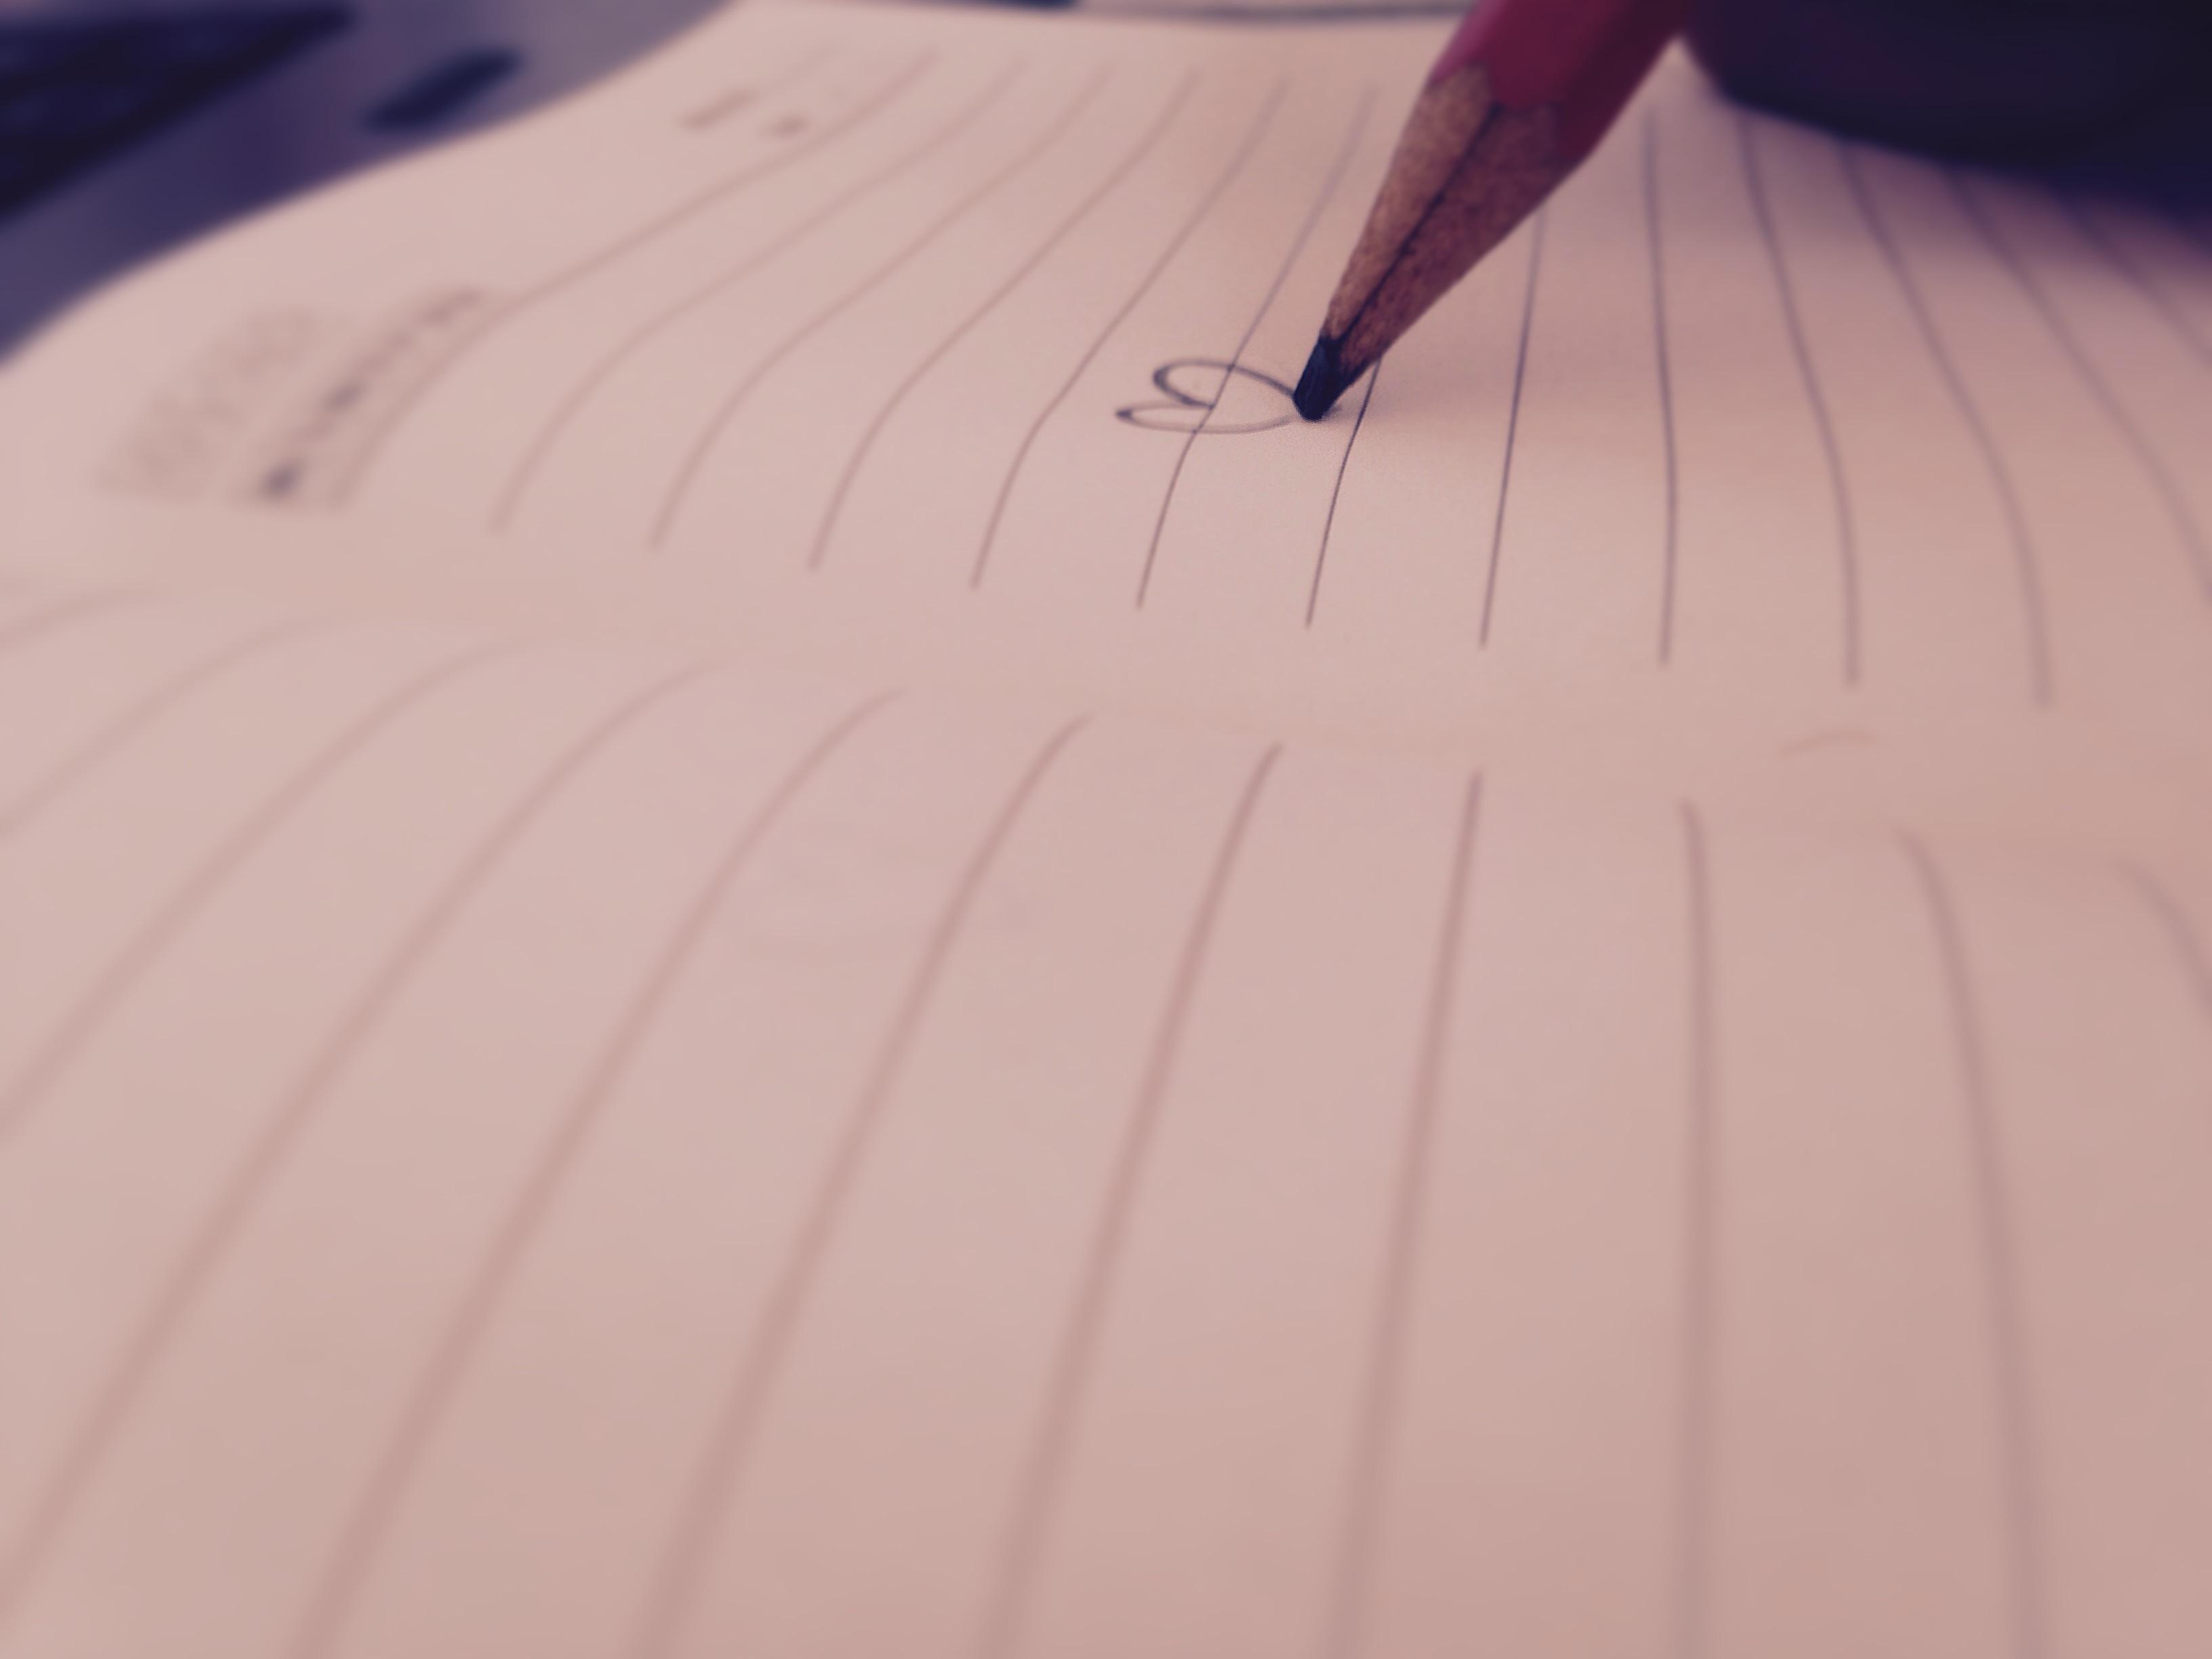 Gambar Penulisan Tangan Sayap Pola Garis Kertas